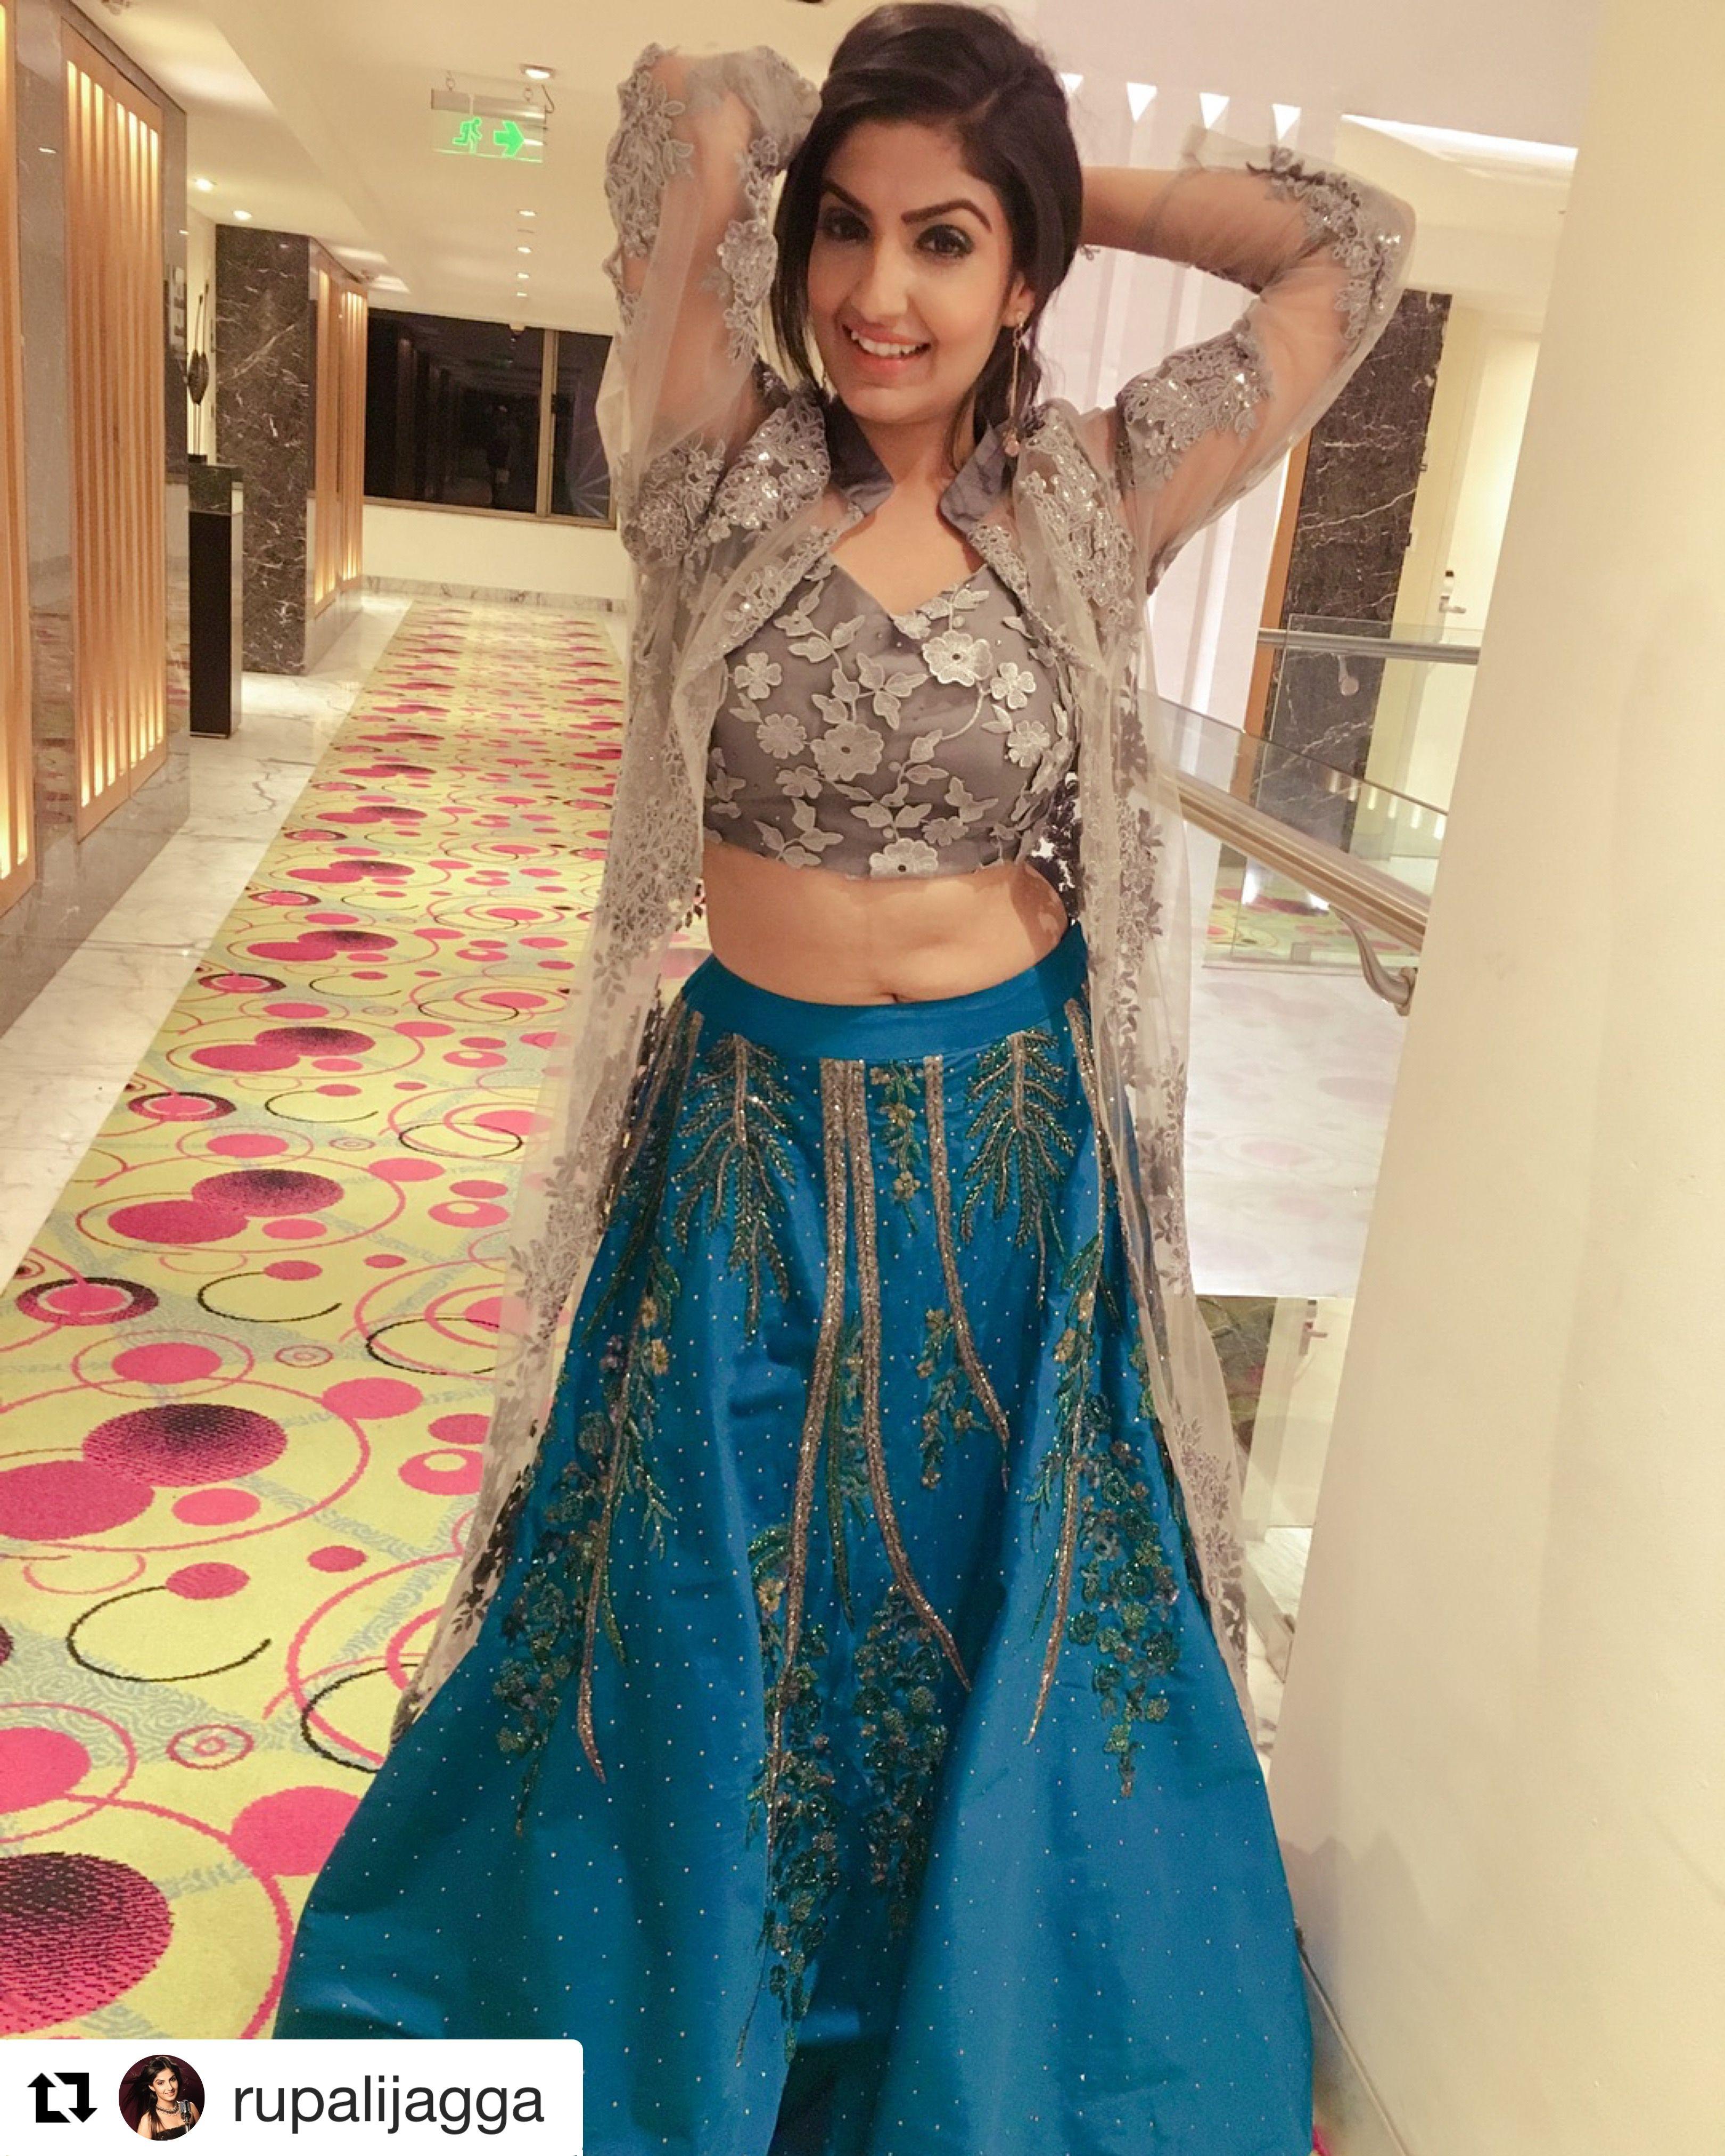 748f68551f Outfit designed by aliyafashionhouse For more updates follow us on  instagram @aliyafashionhouse Waist Skirt,